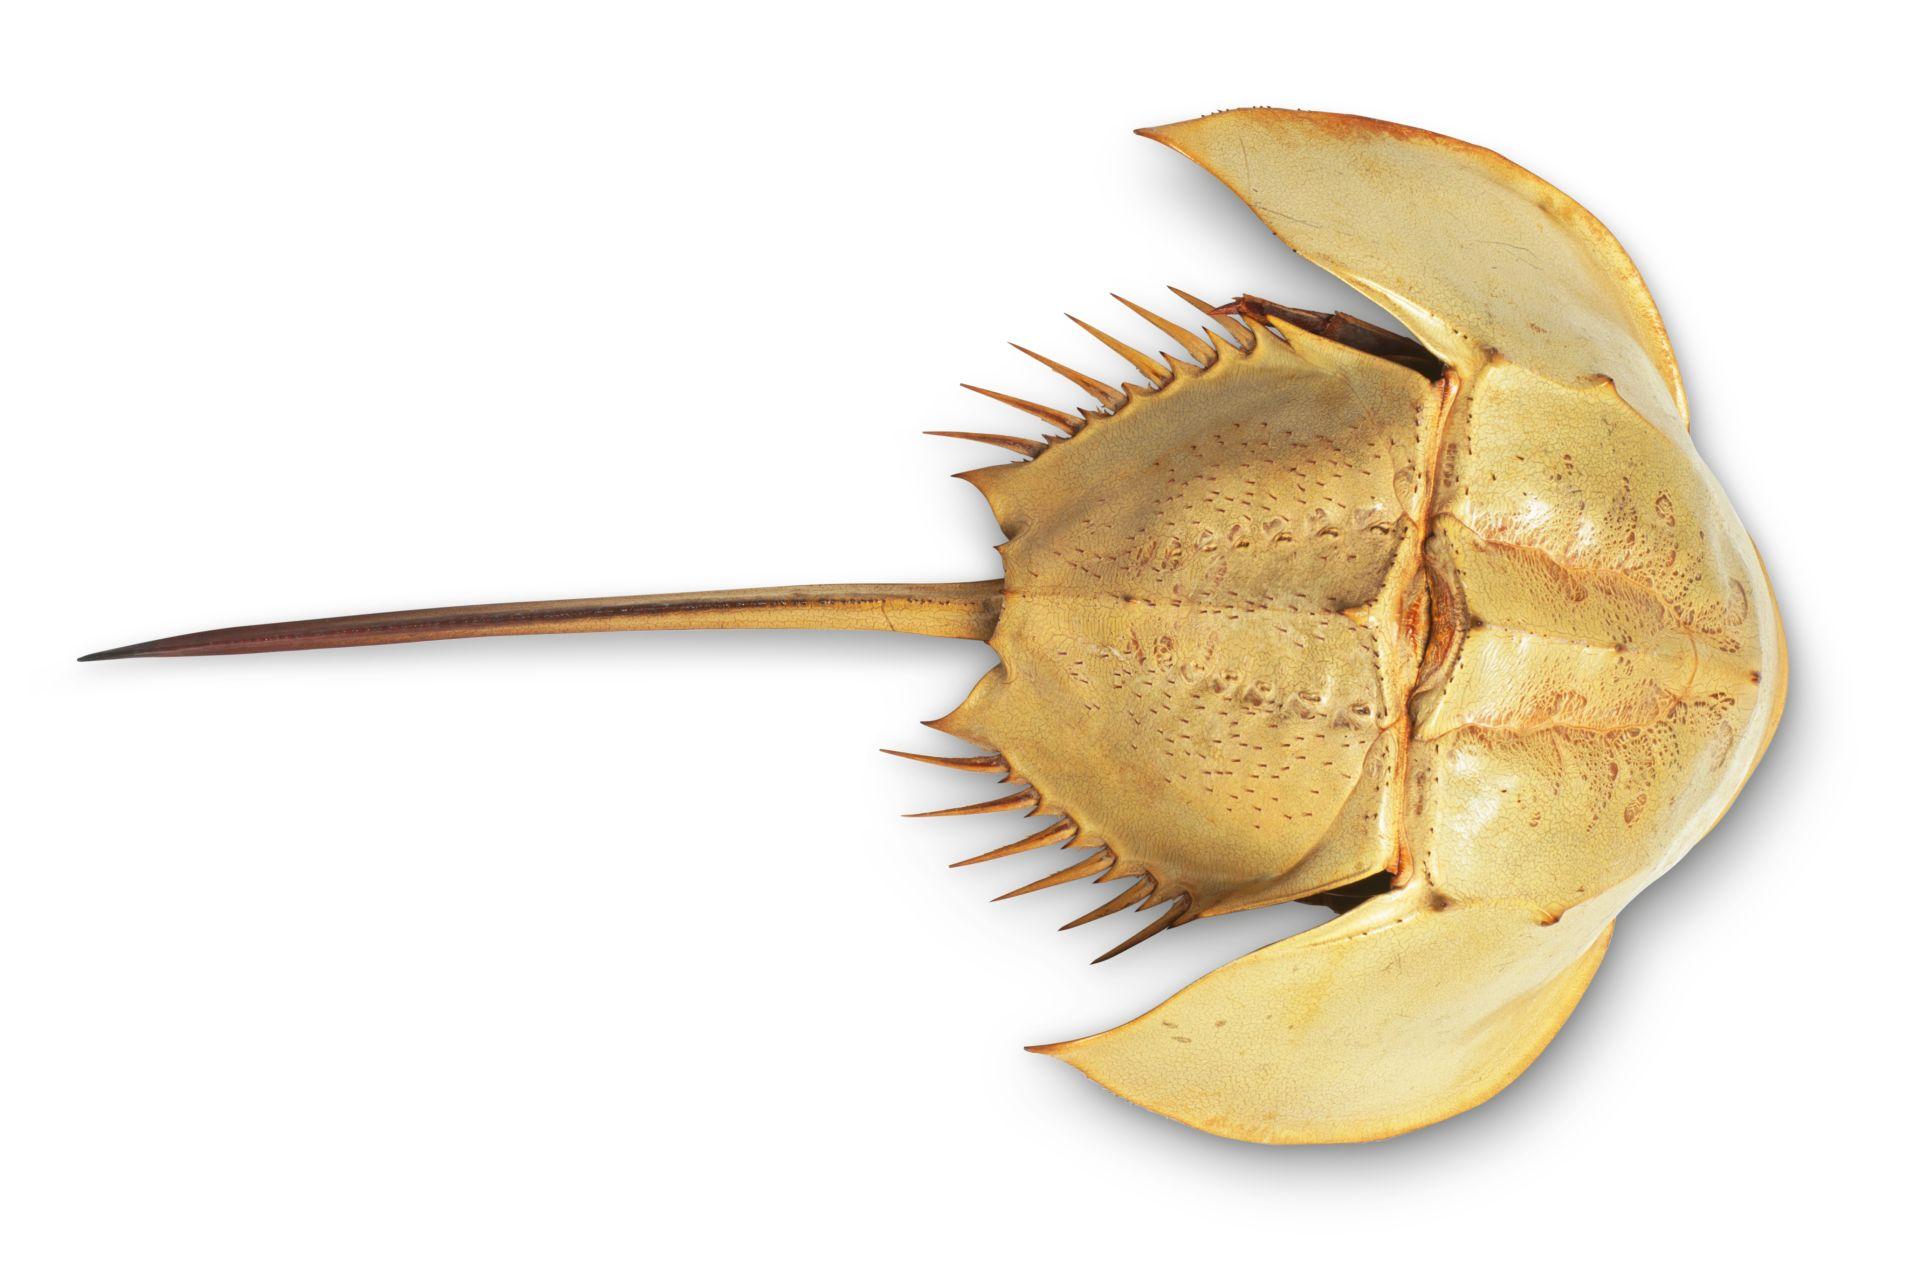 how to cook horseshoe crab